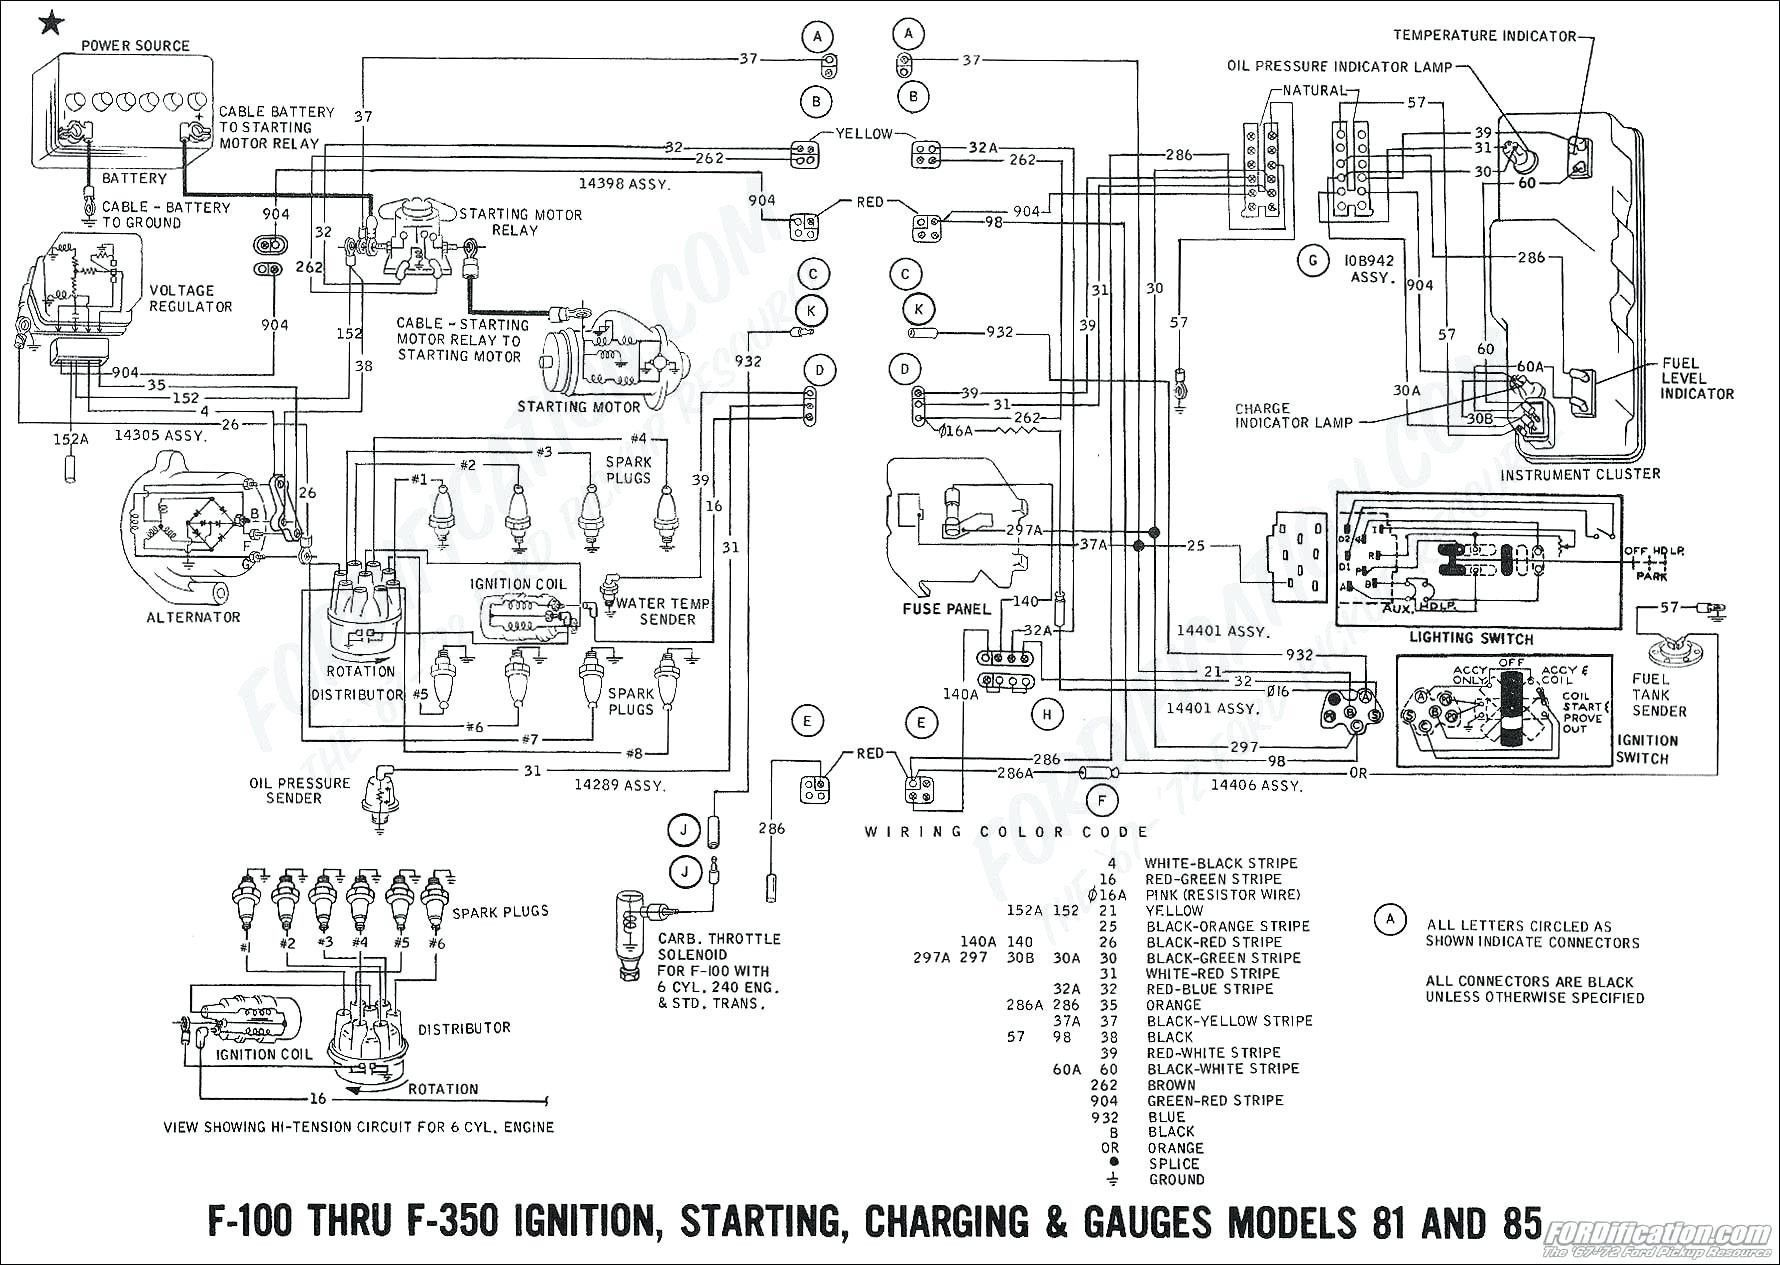 7 3 Idi Glow Plug Controller Wiring Diagram Awesome In 2020 Ford Truck Diagram Design Diagram